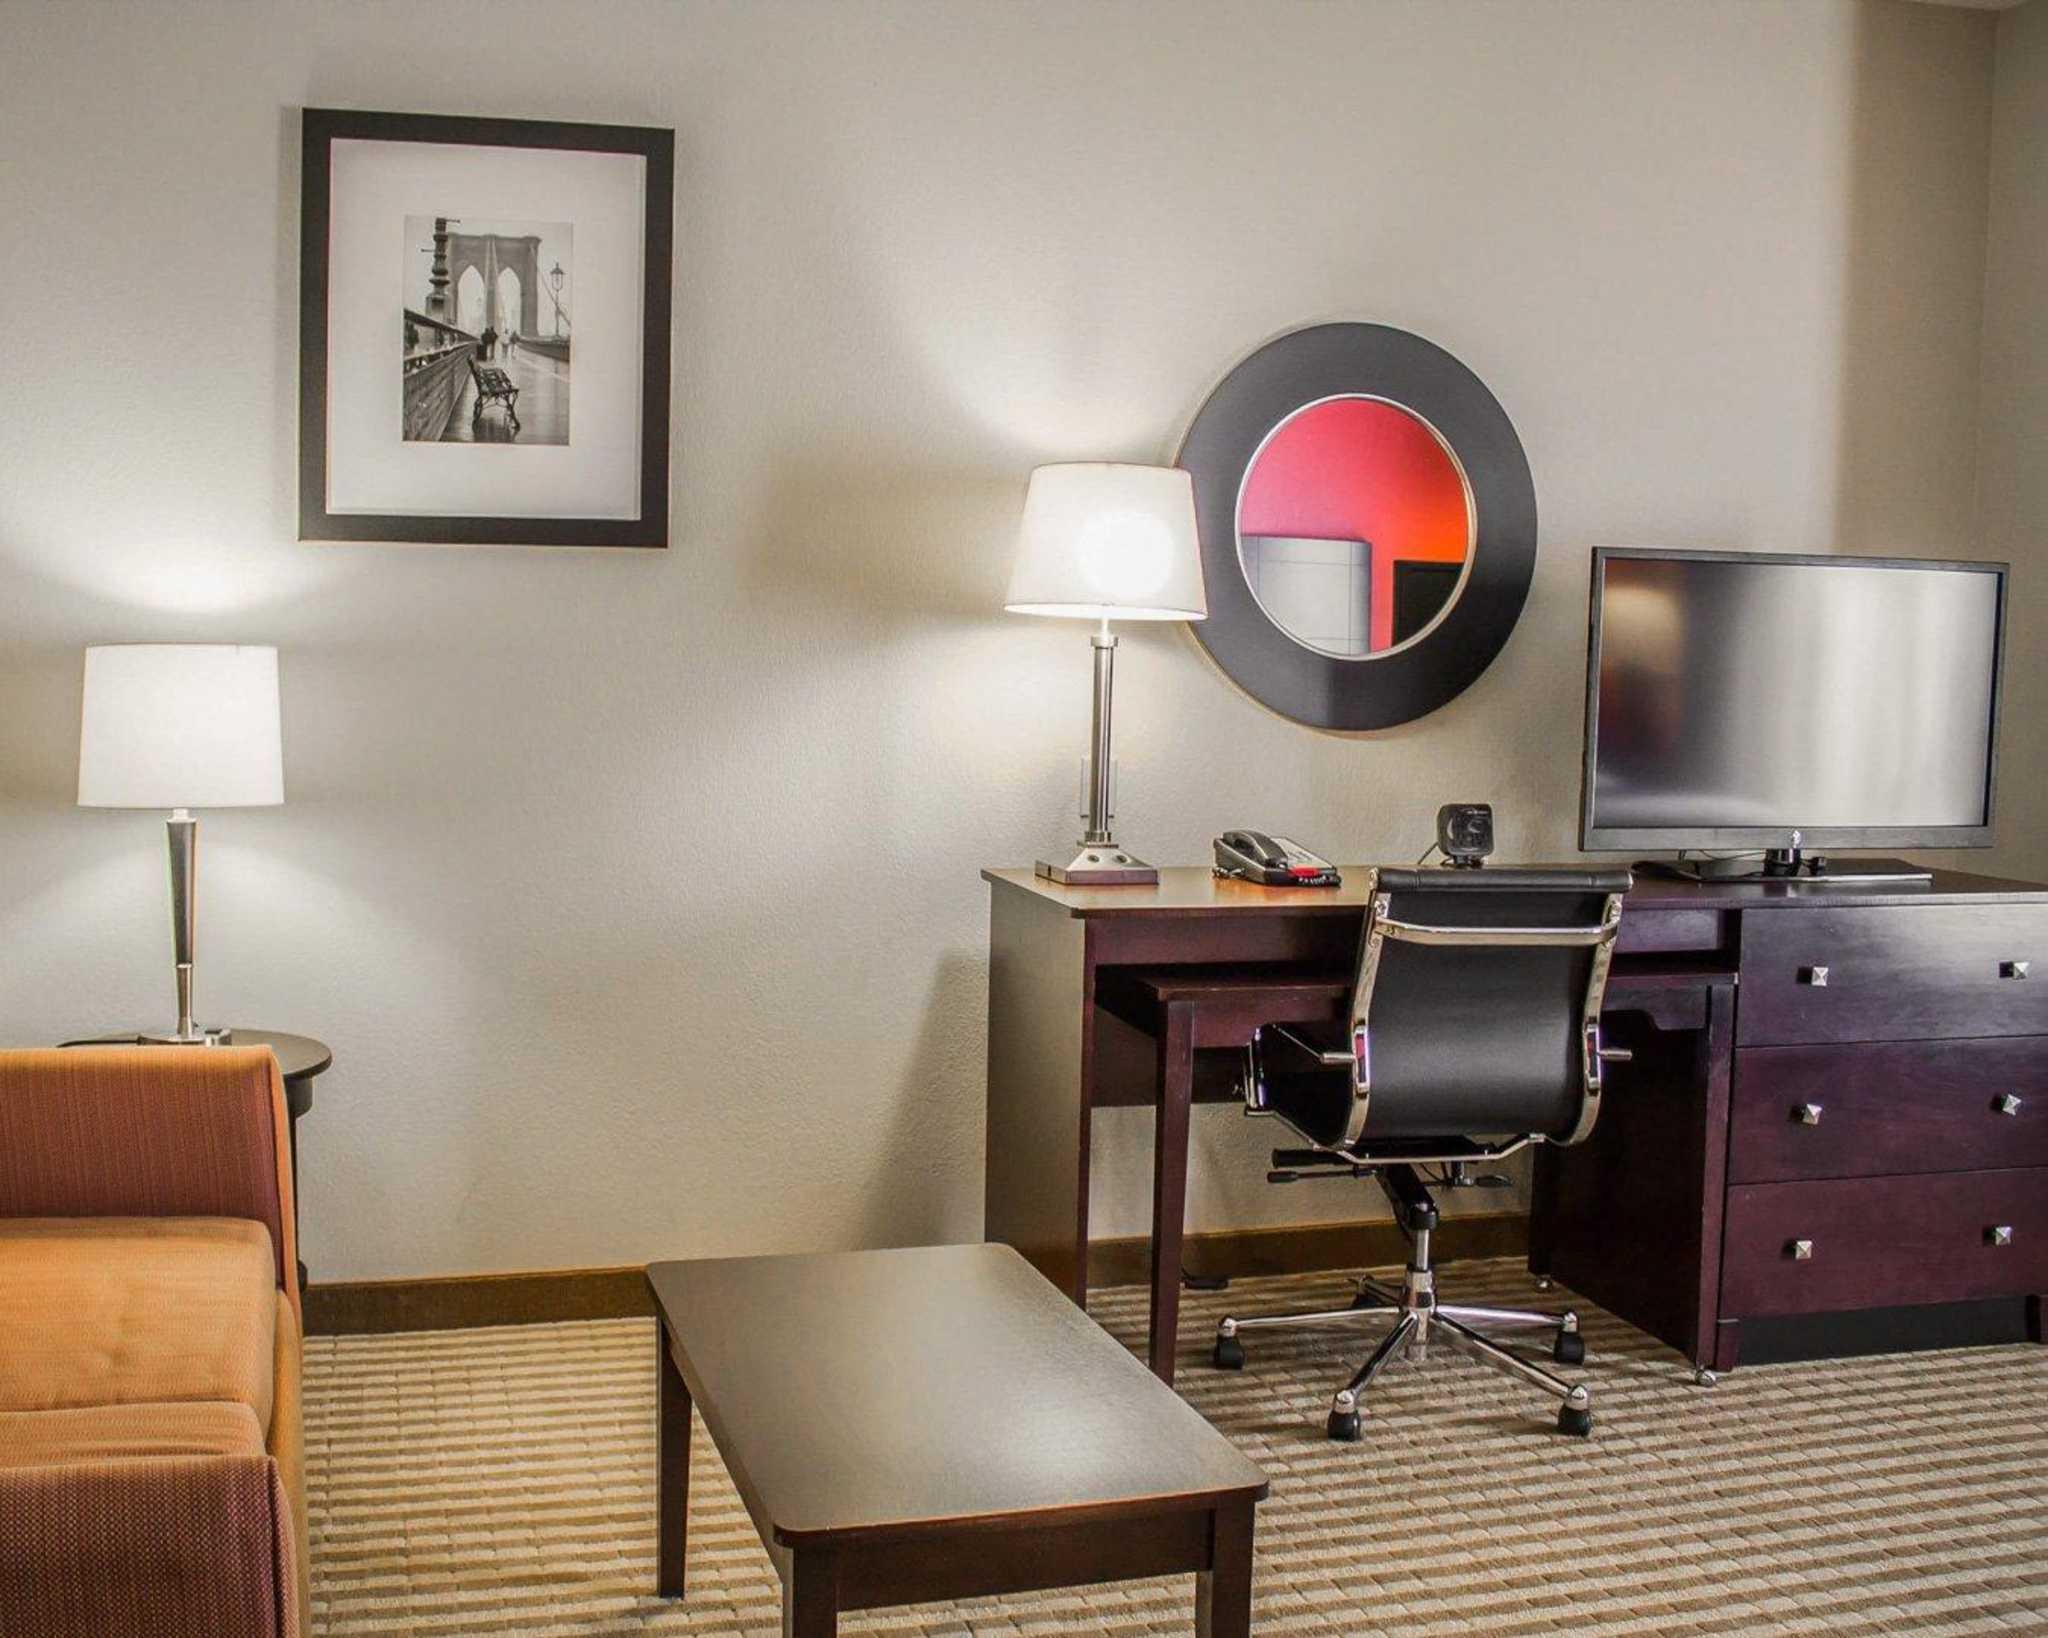 Comfort Suites East Broad at 270 image 14